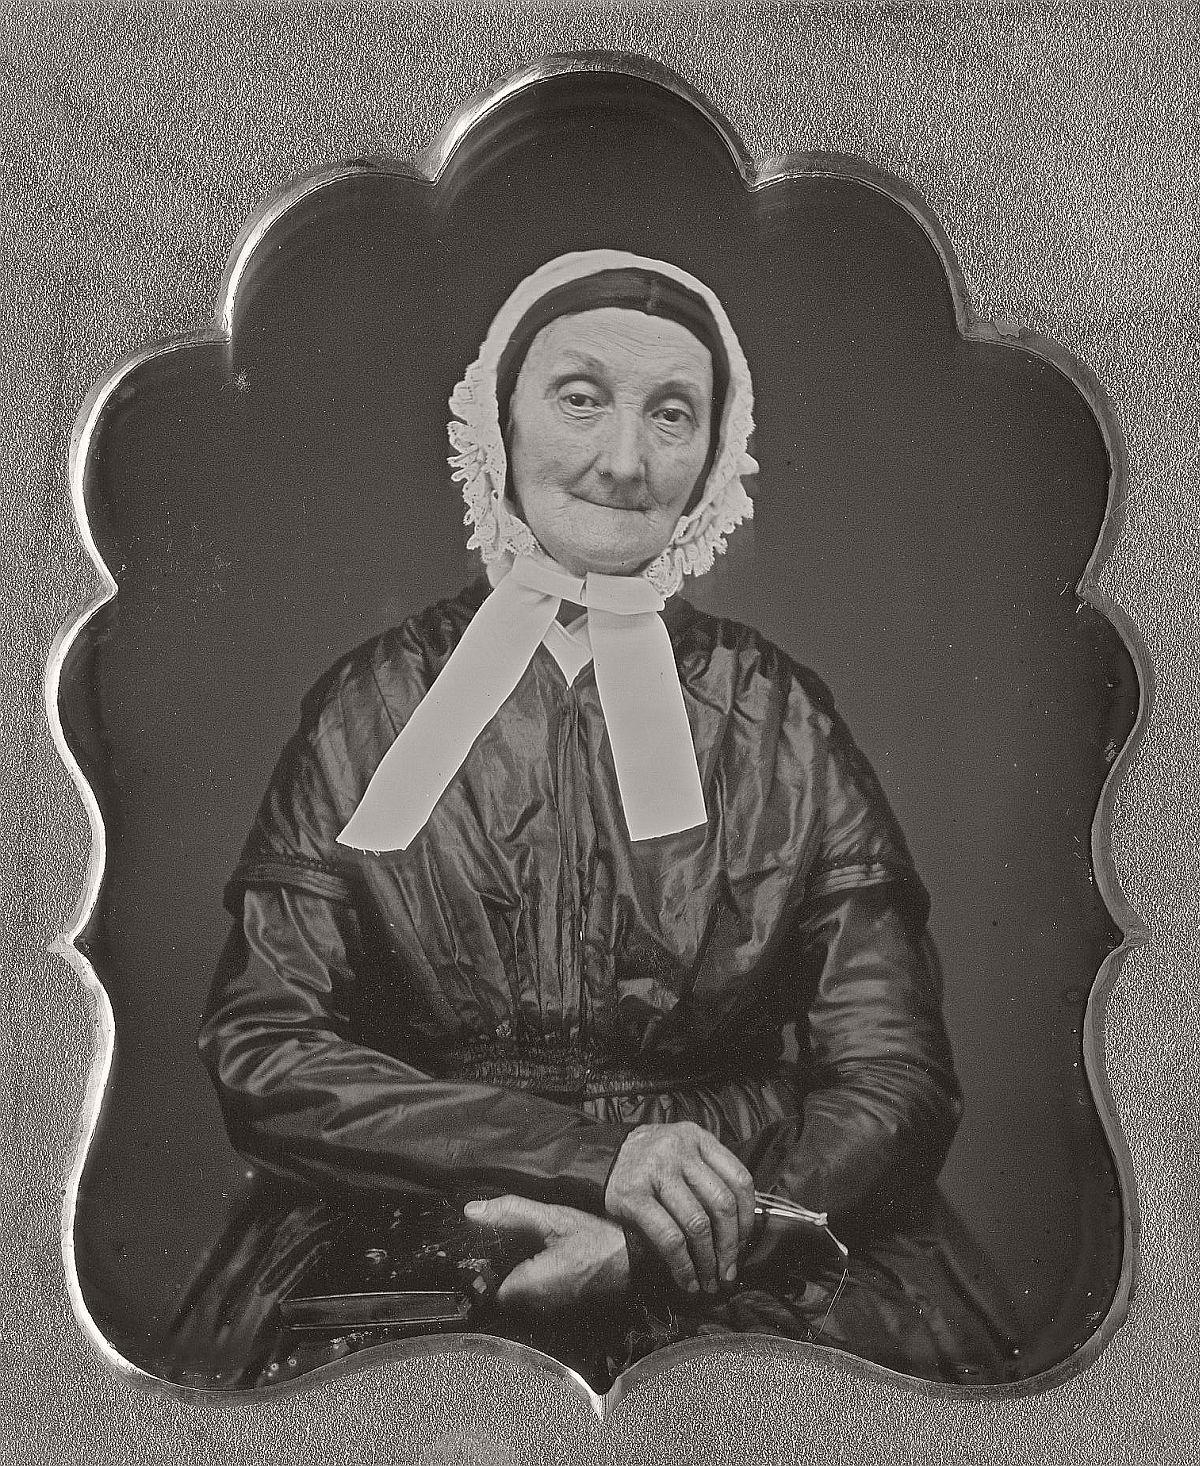 daguerreotype-portrait-people-born-in-the-late-18th-xviii-century-1700s-vintage-44